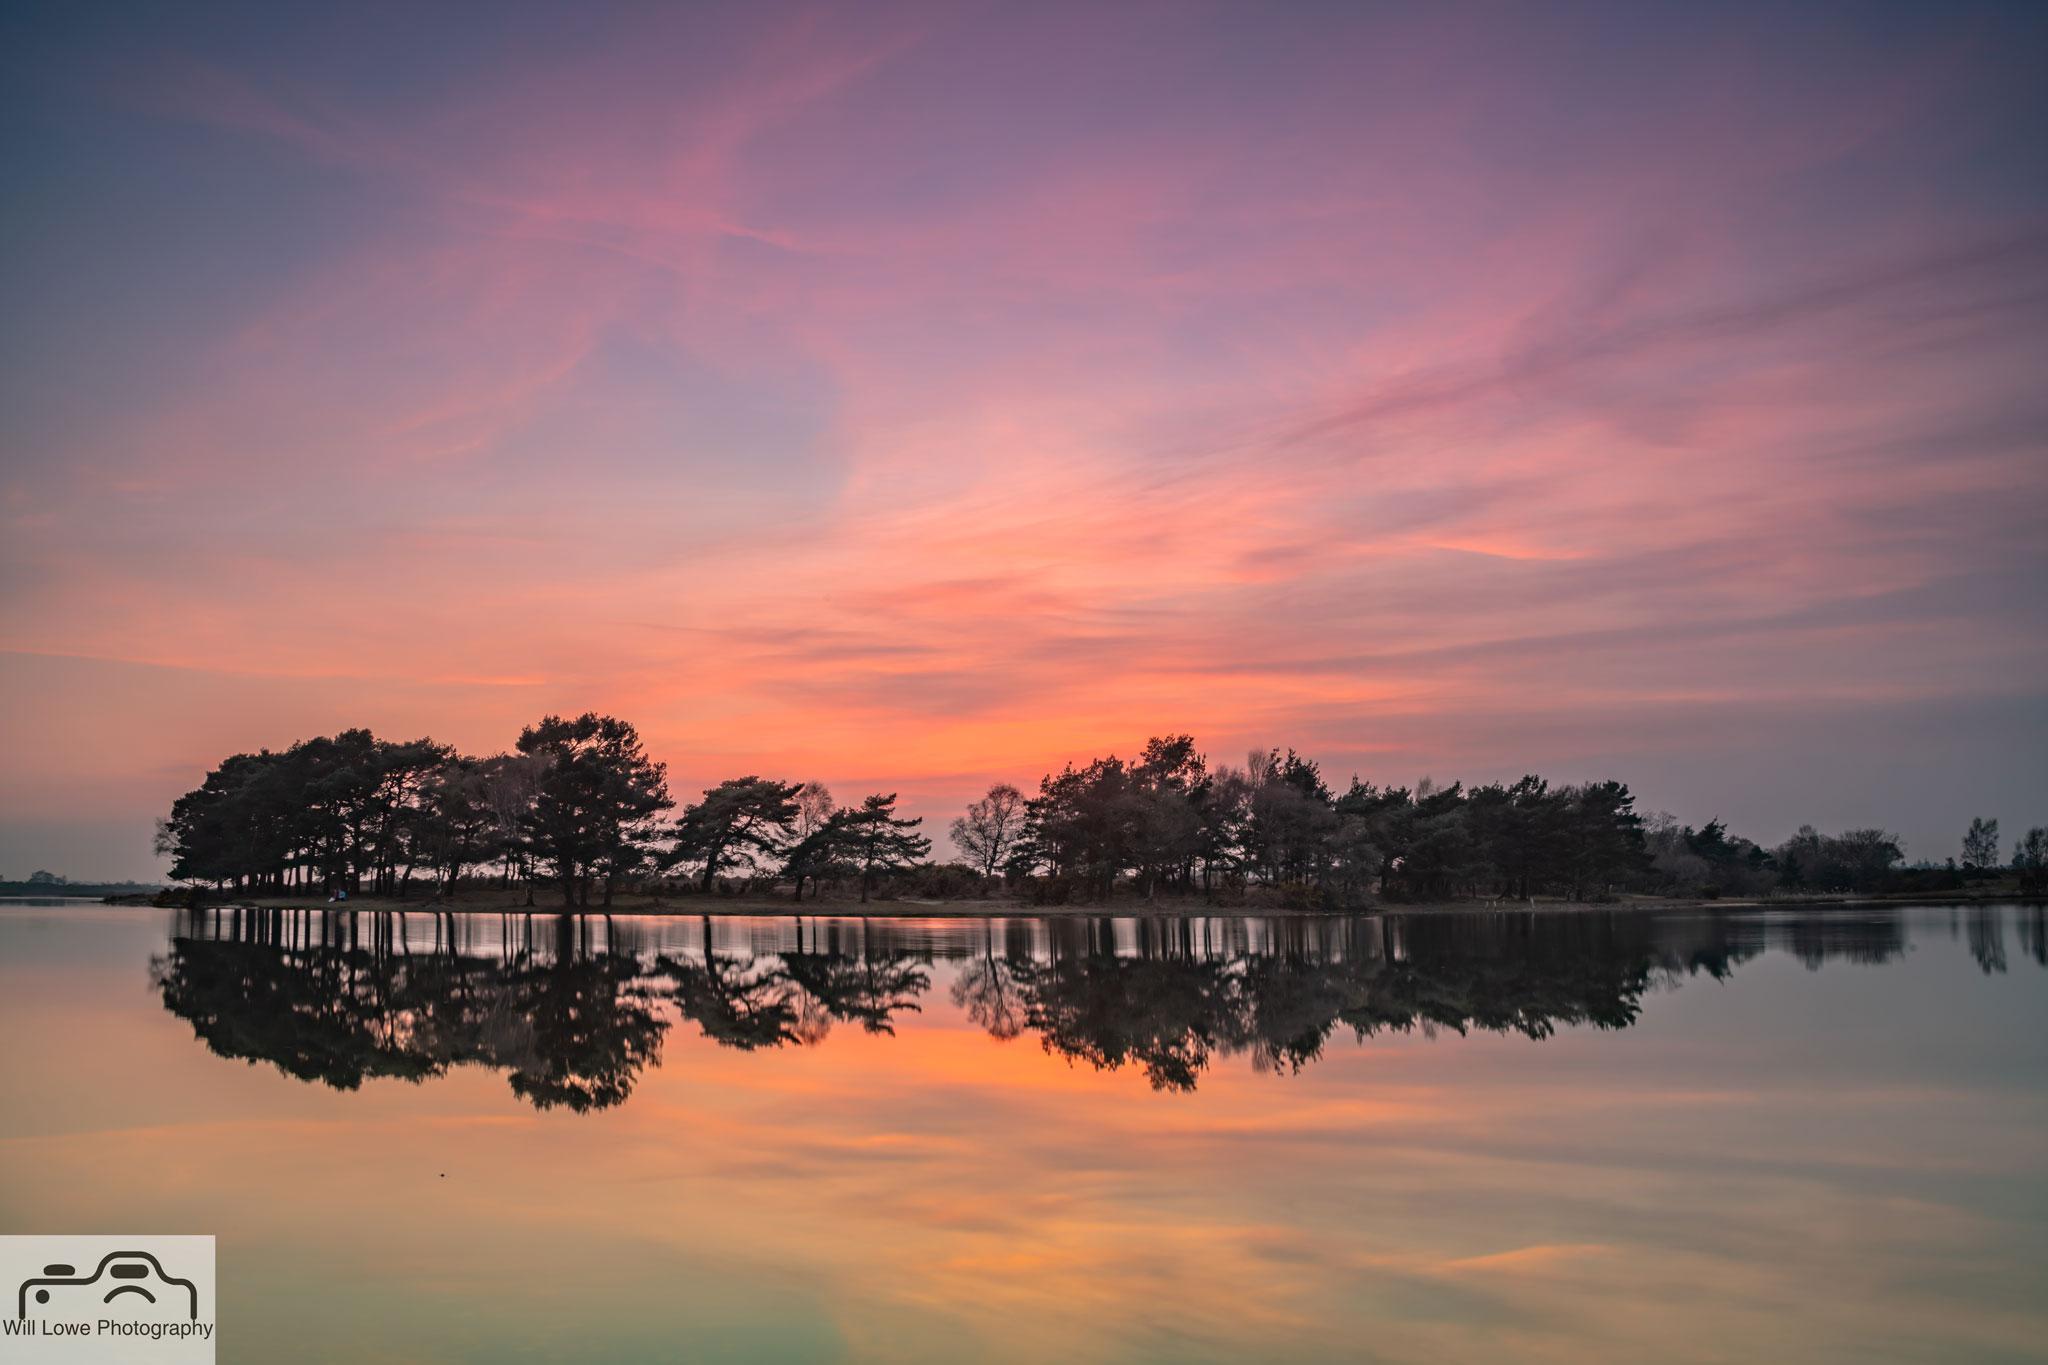 Sunset Hatchett Pond - New Forest